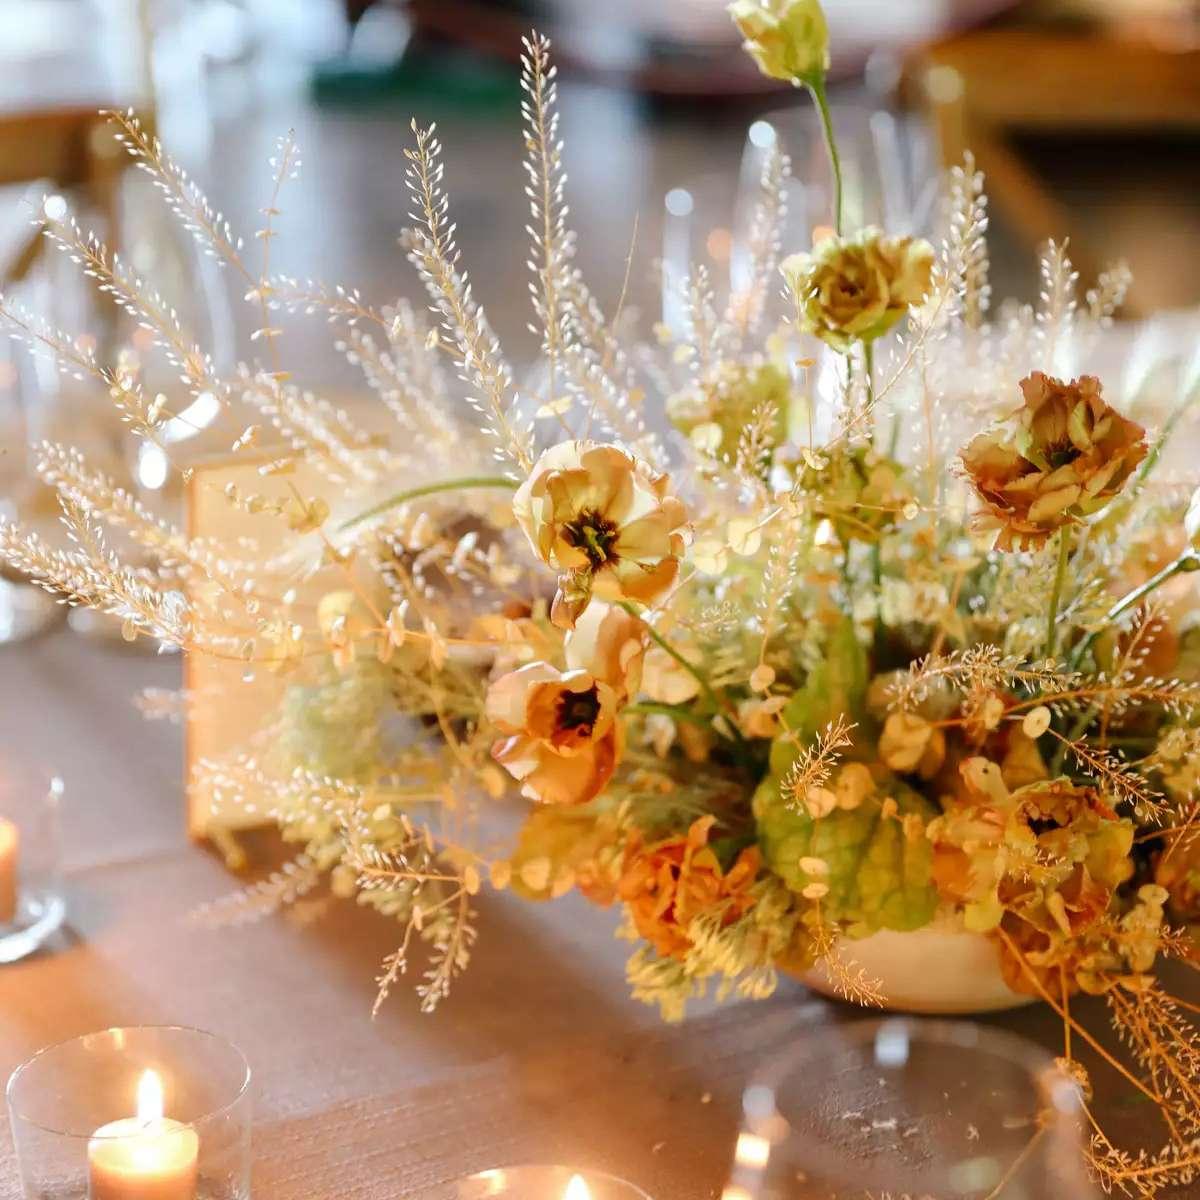 Nude votive candles and textured arrangements